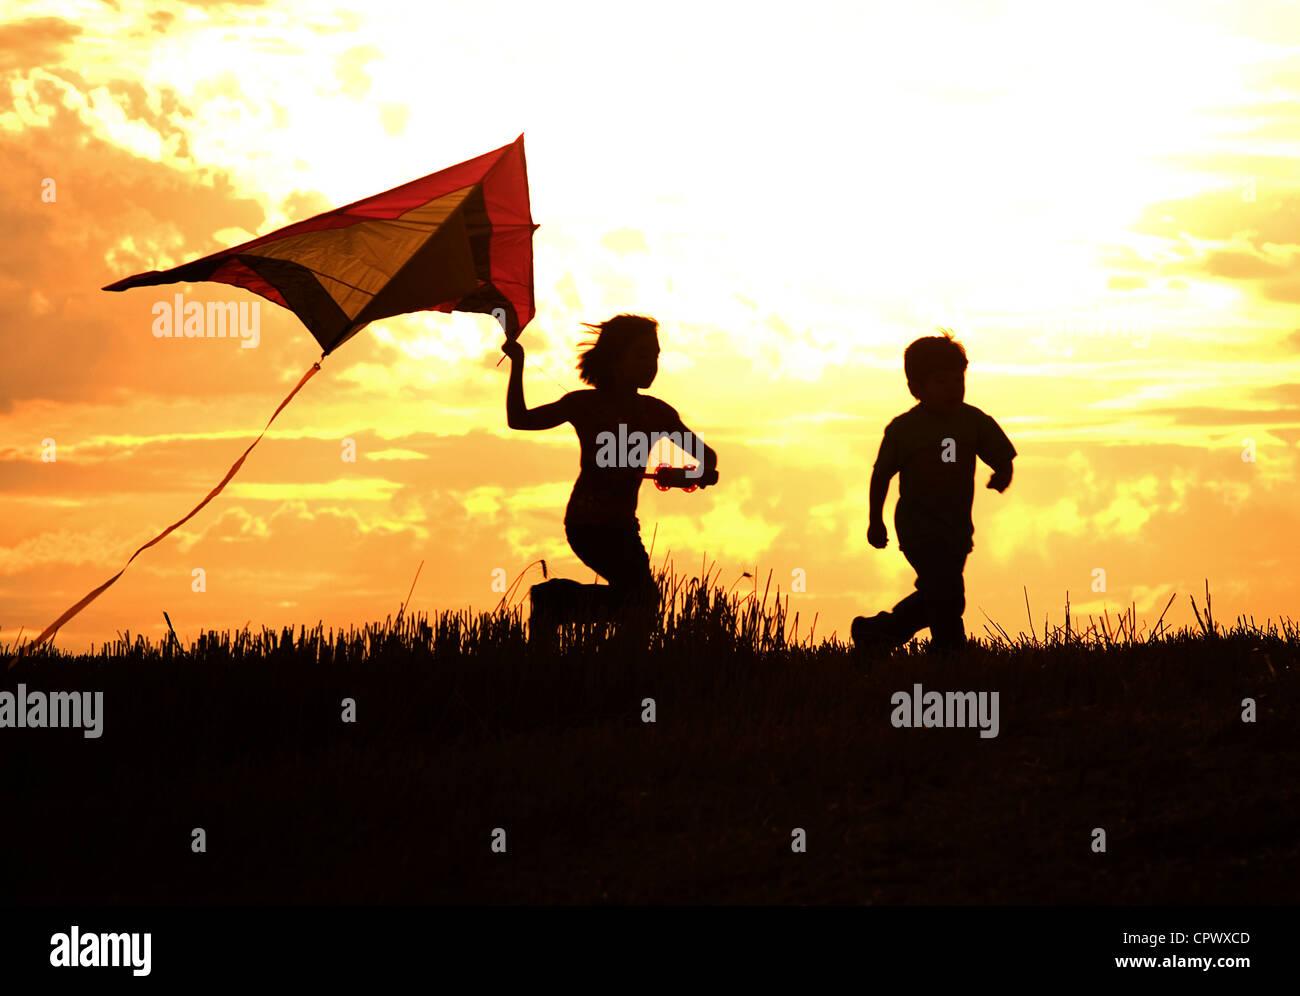 Two kids flying a kite at sunset invoke childhood memories. - Stock Image